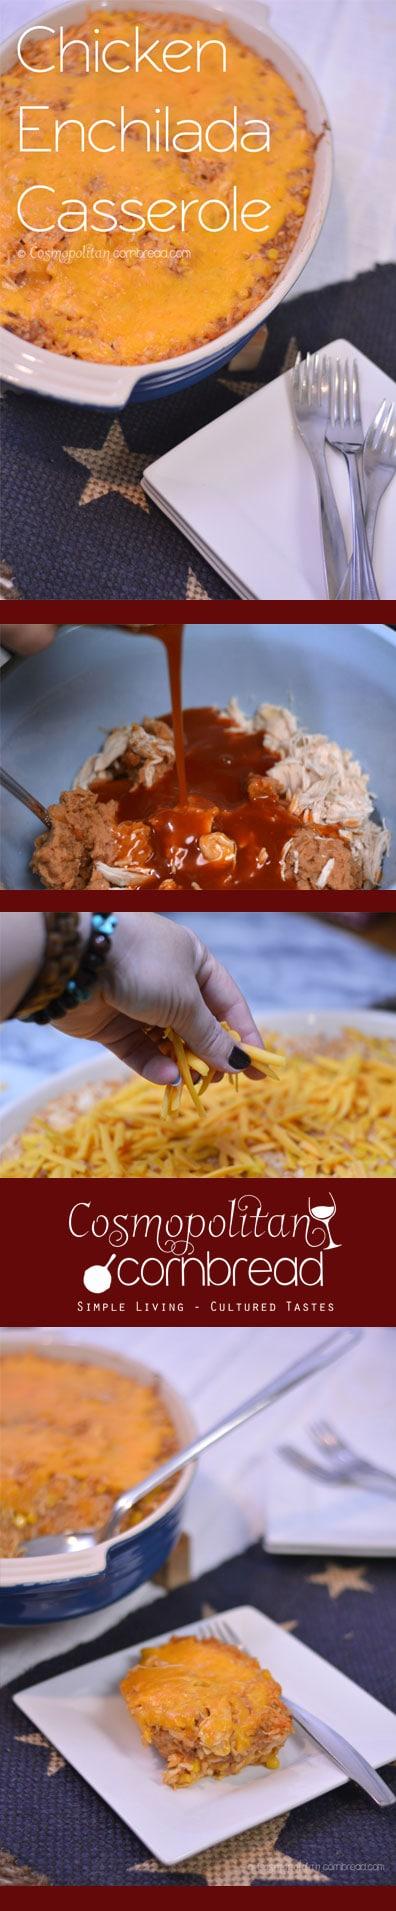 Chicken Enchilada Casserole - a budget friendly meal from Cosmopolitan Cornbread